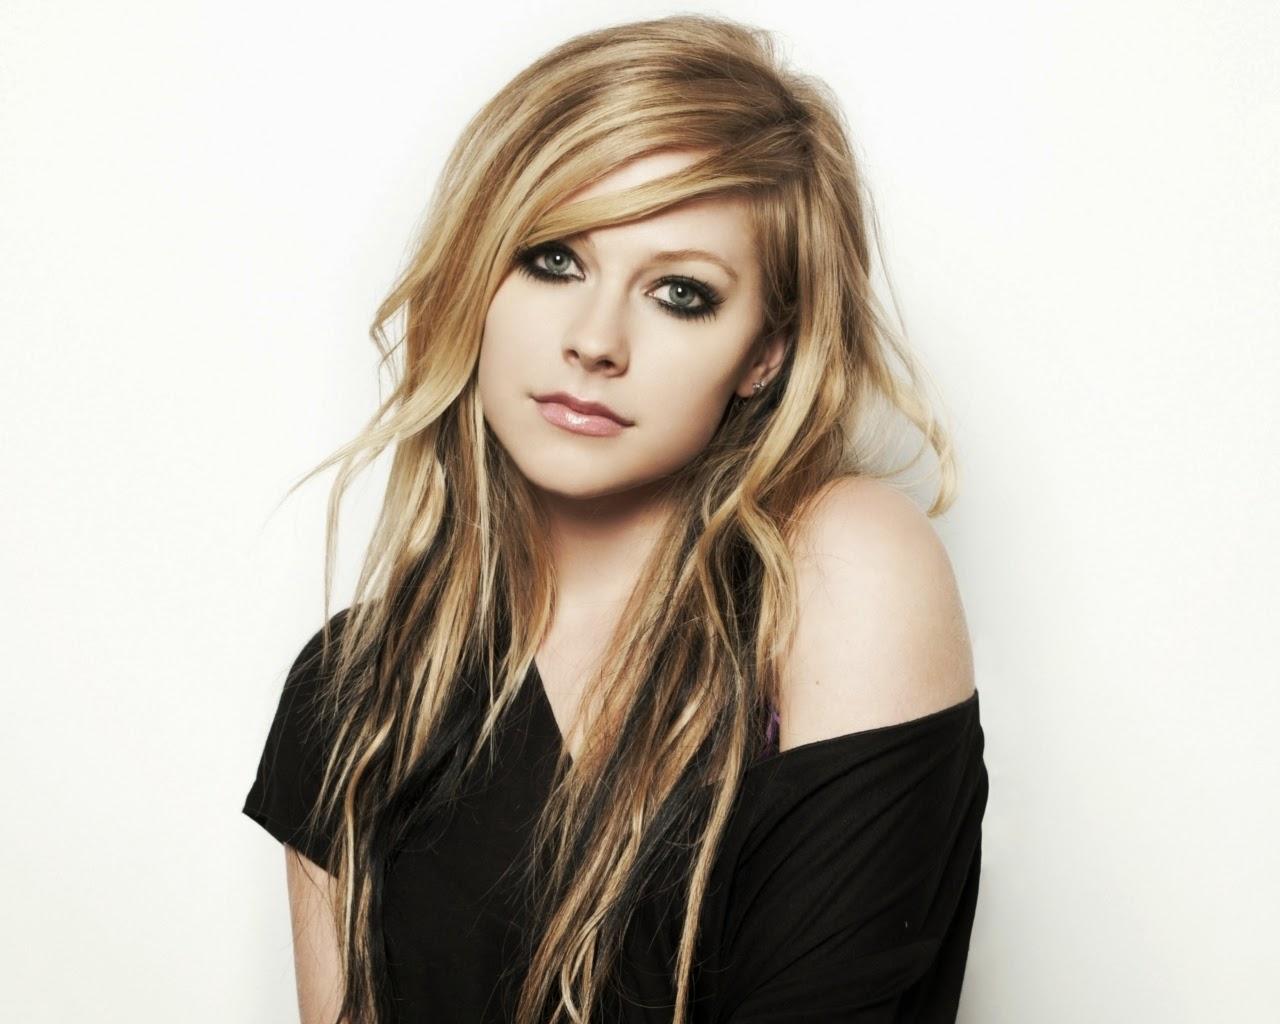 Profil Lengkap dan Biodata Avril Lavigne